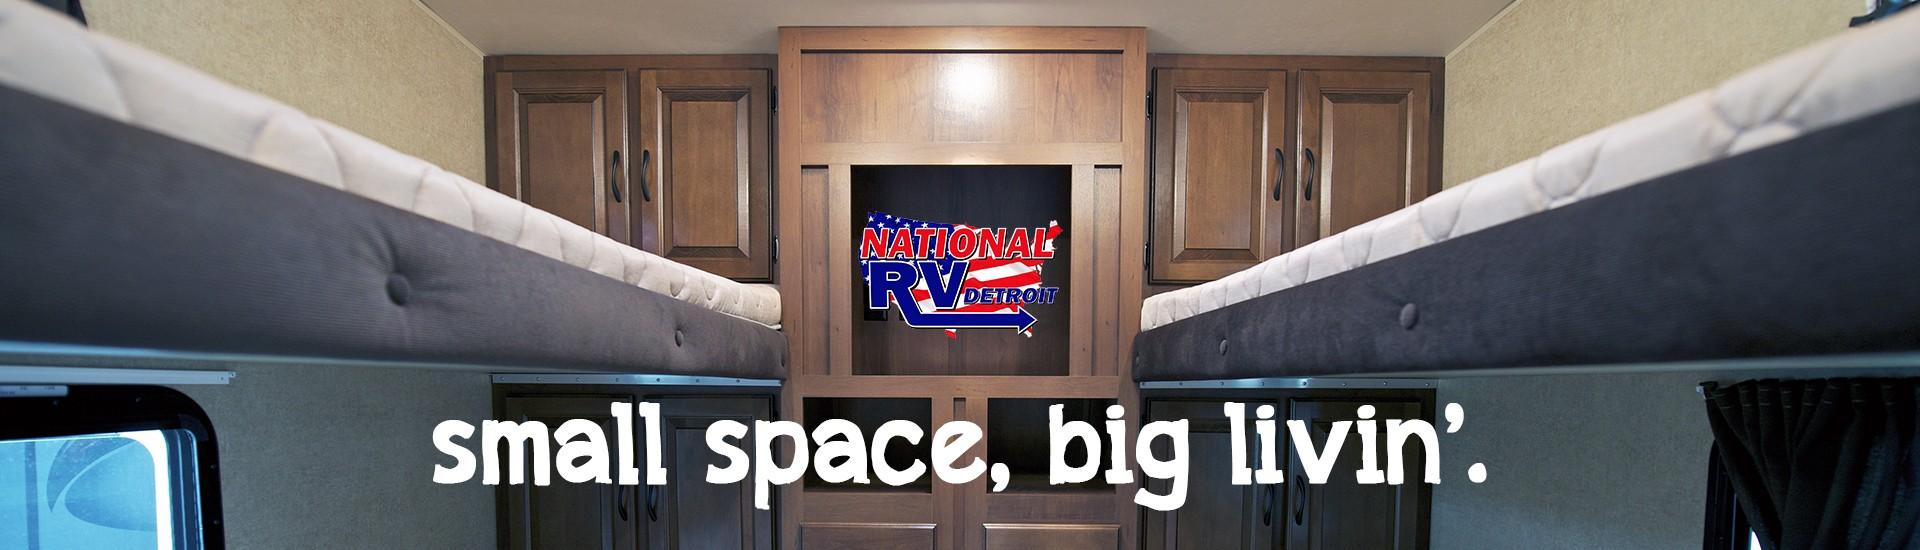 small space big livin